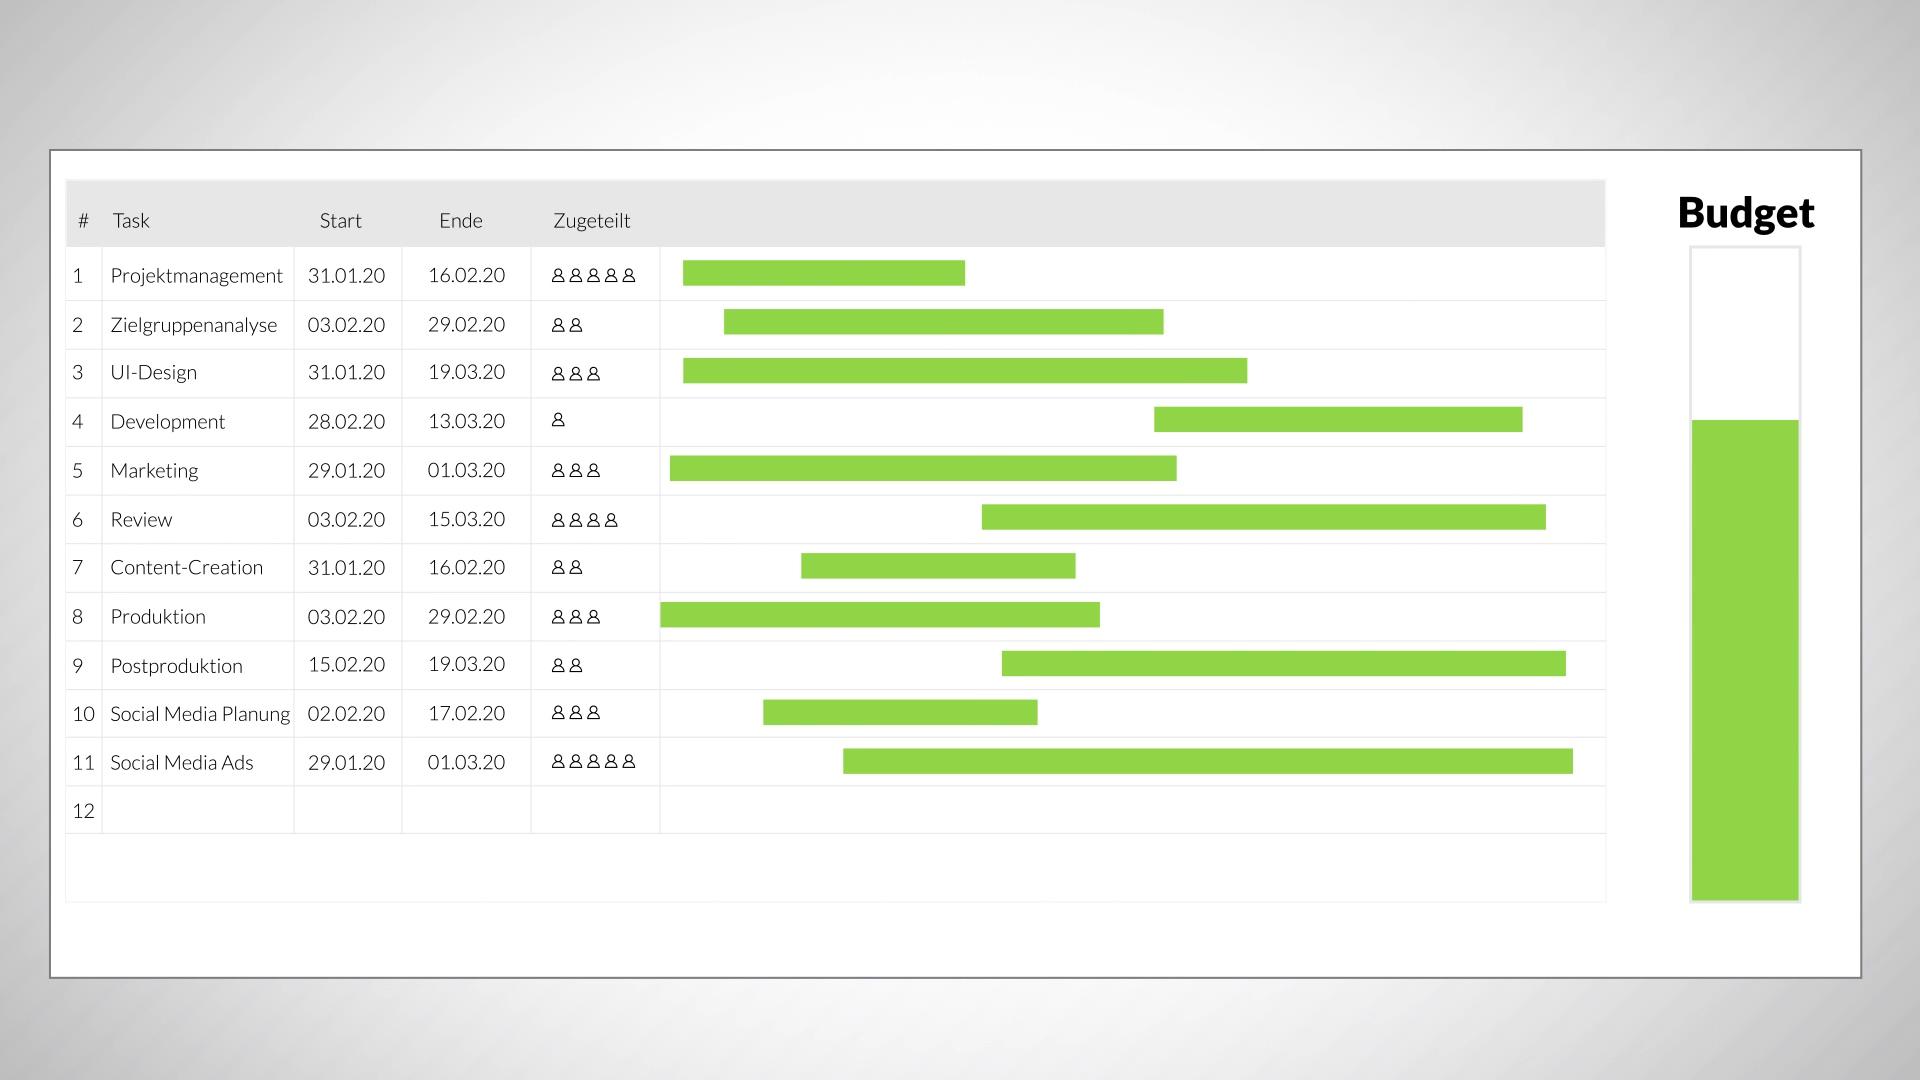 CanDo_Erklärvideo_FINAL_WEB_1080P_5Mbits